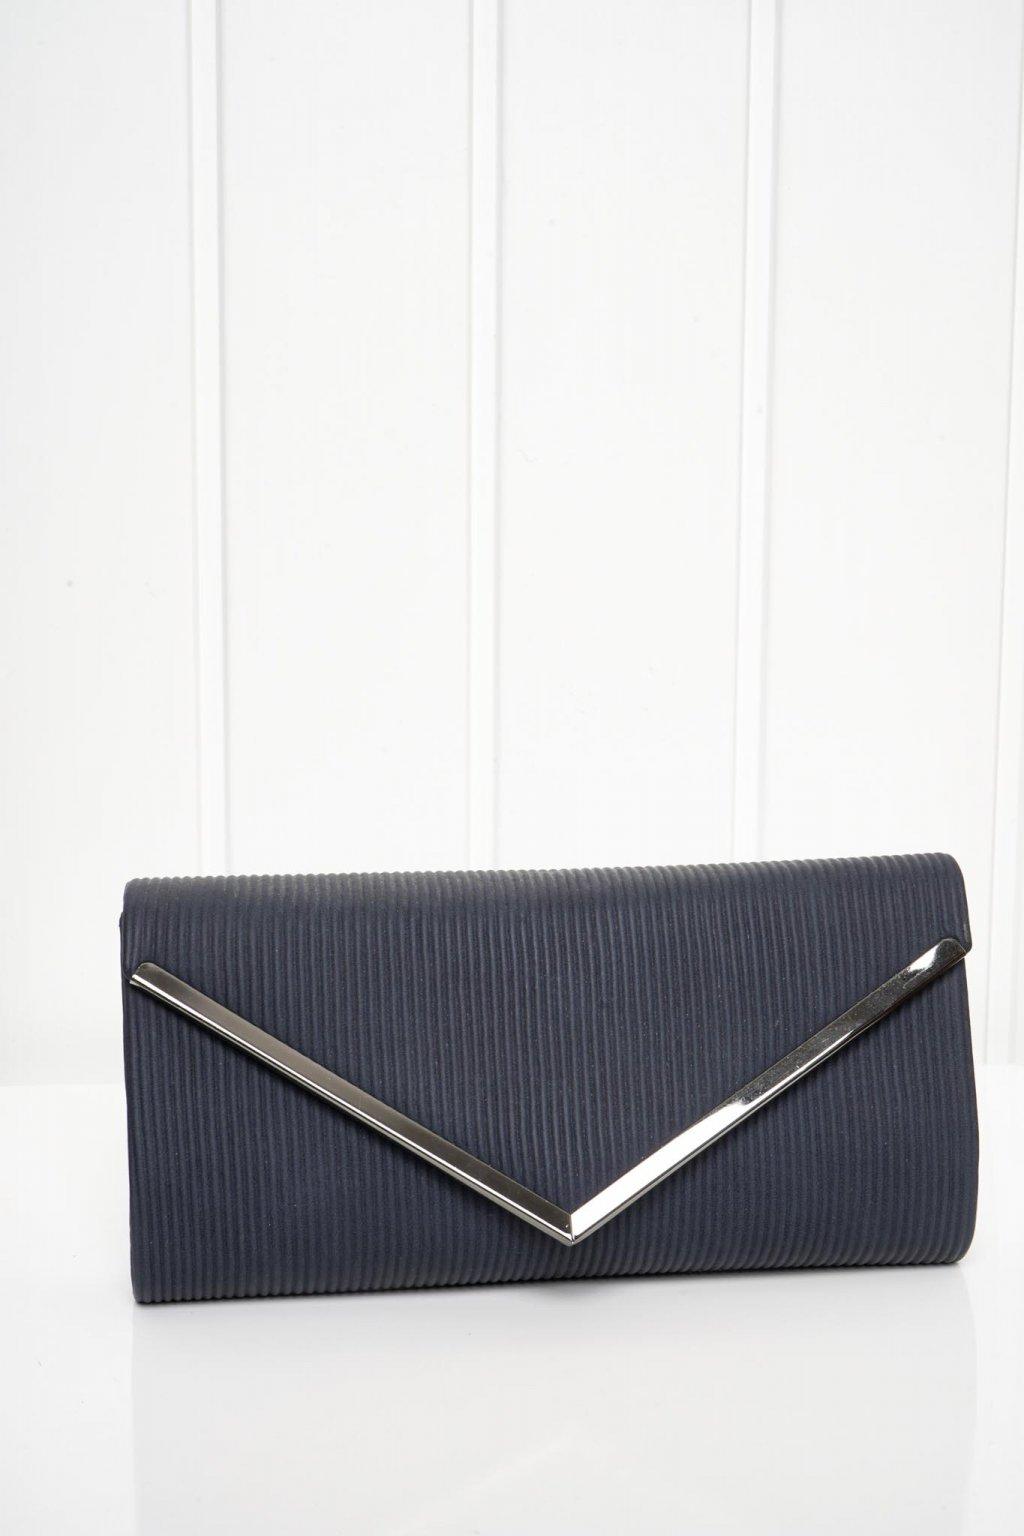 Kabelka, crossbody, ruksak, shopping bag, shopperka, 552